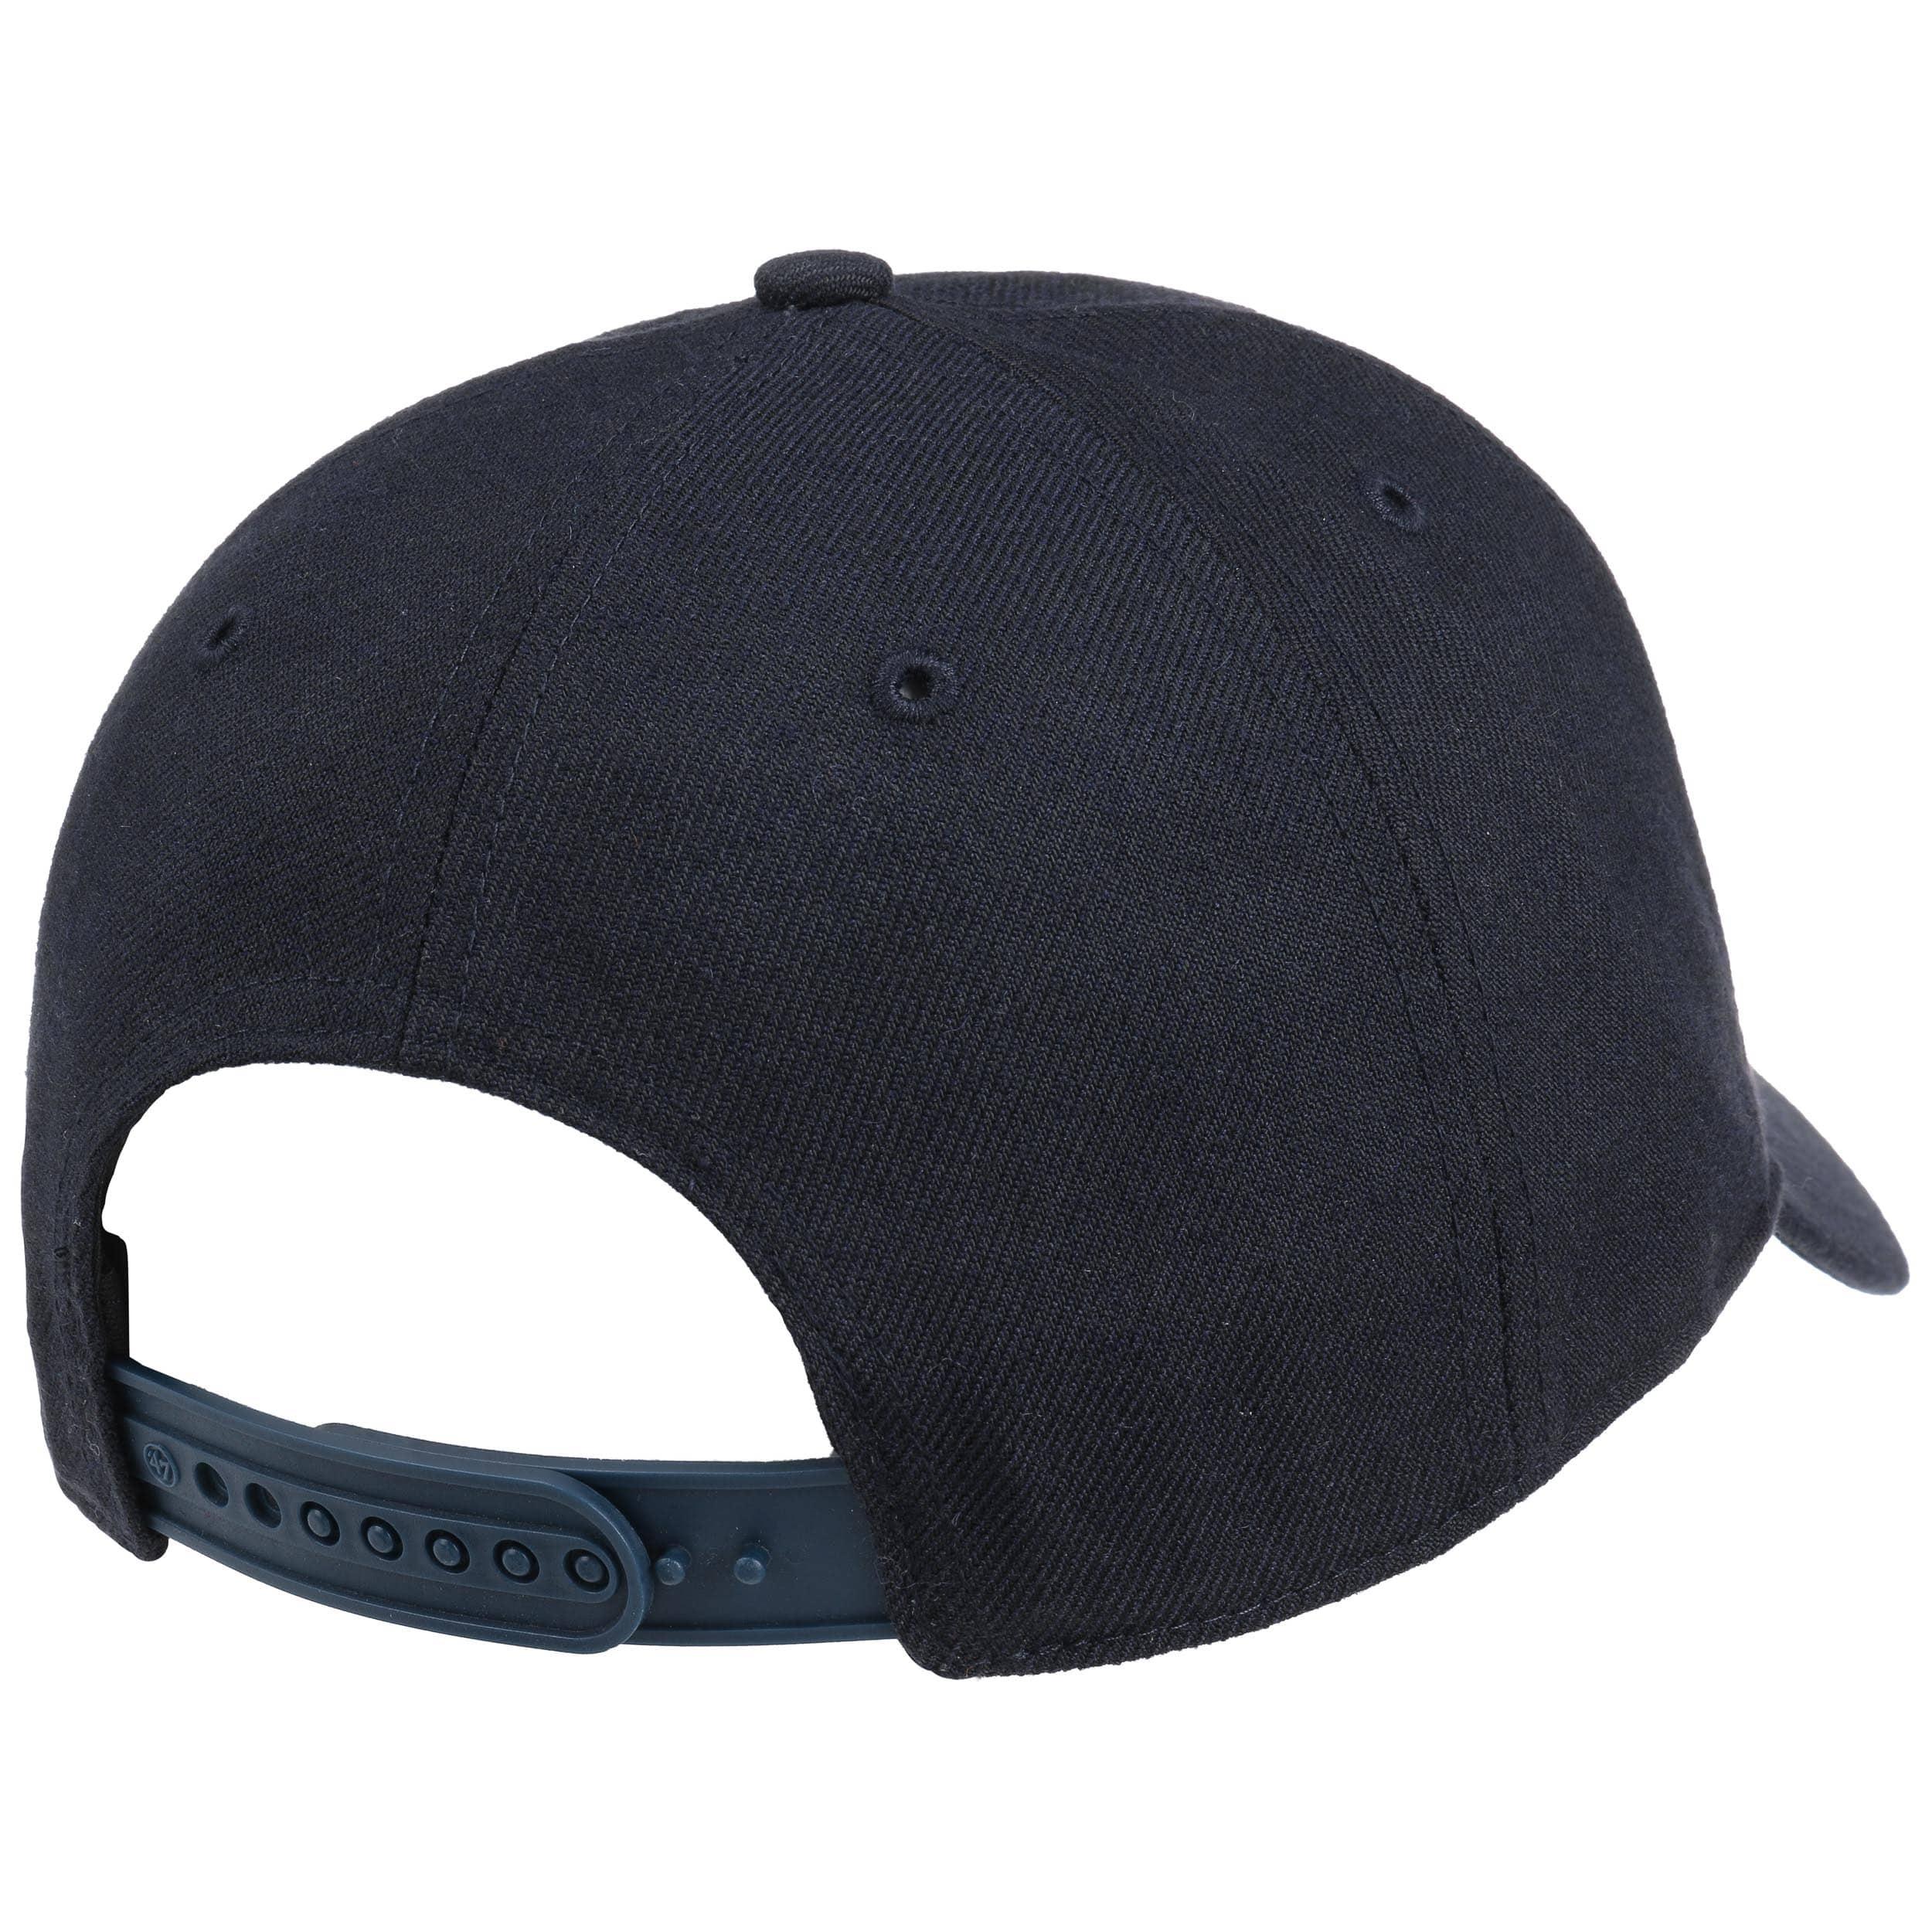 Gorra MVP Snapback Yankees by 47 Brand - Gorras - sombreroshop.es e399017b8c4